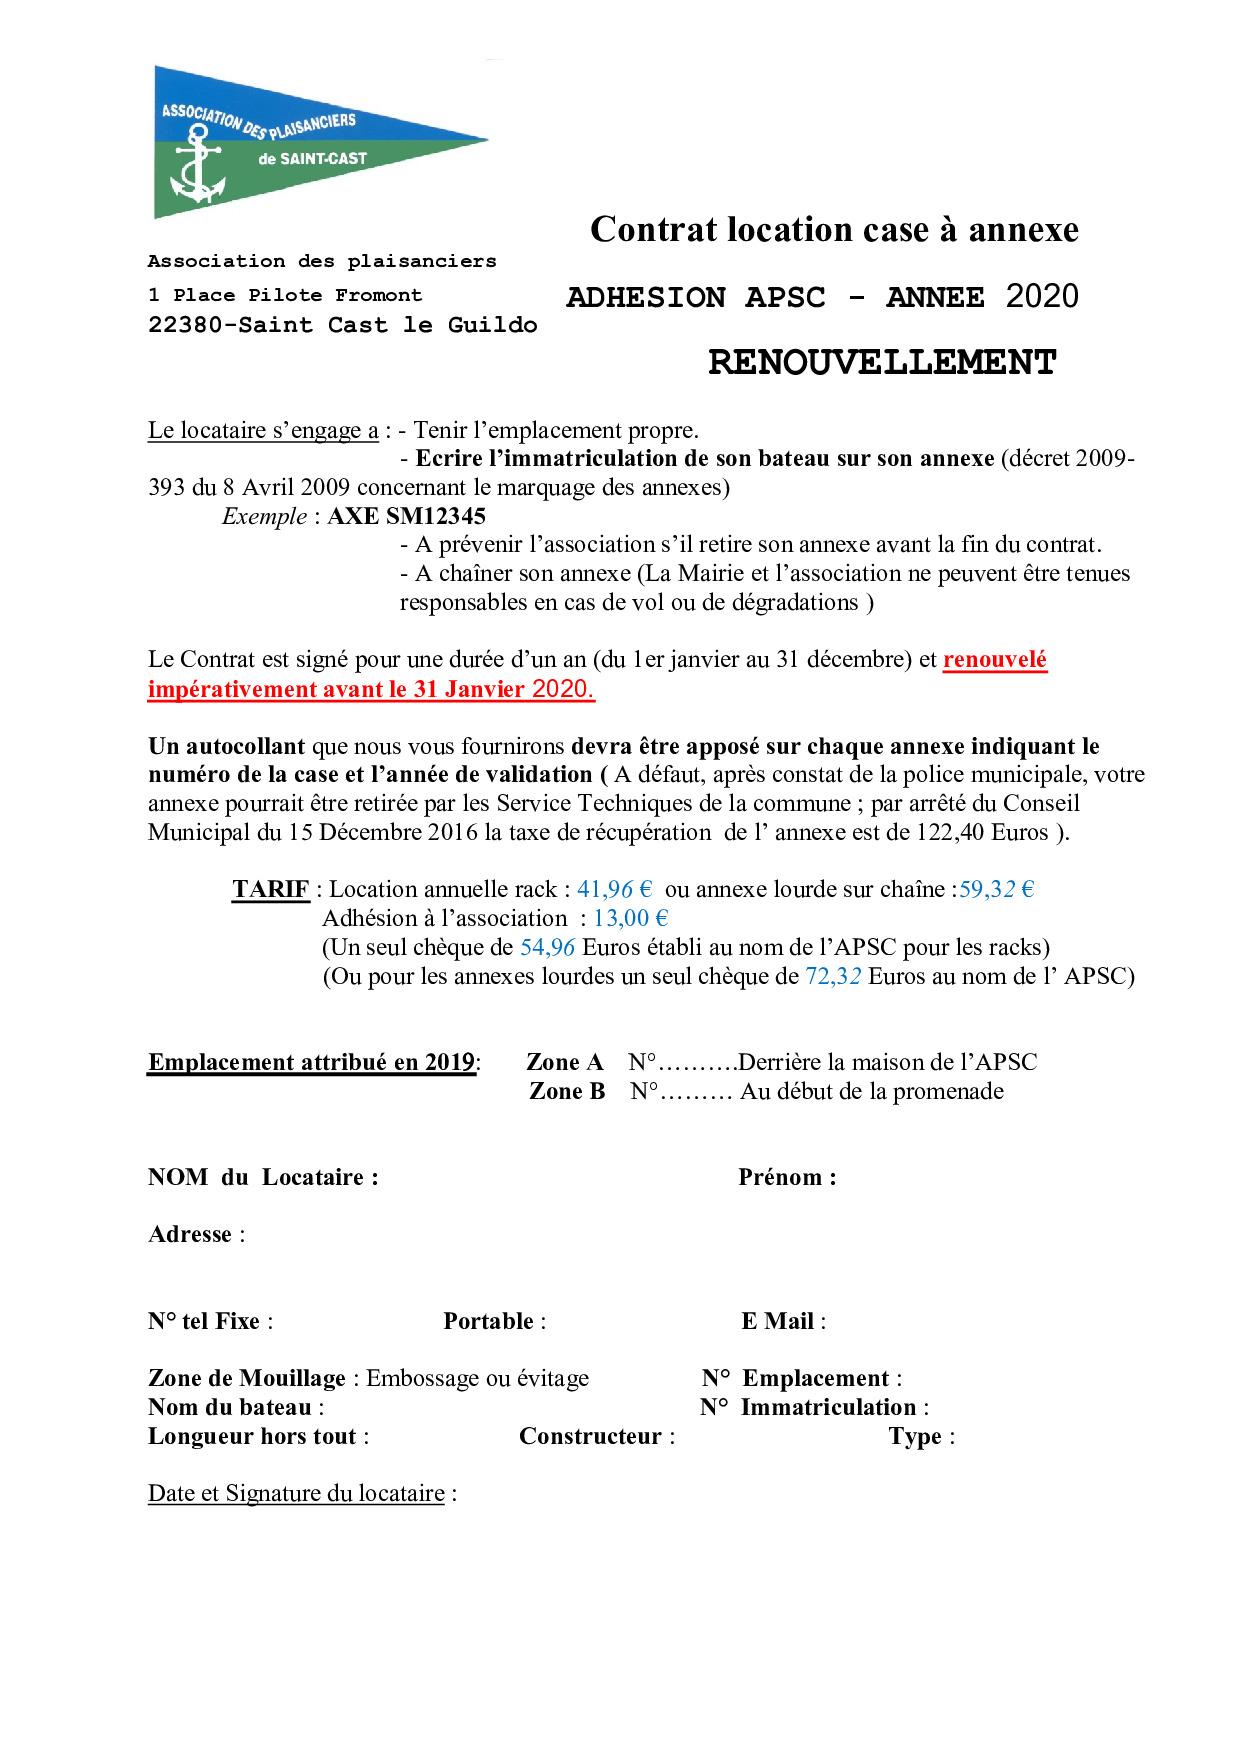 Contrat location case annexe